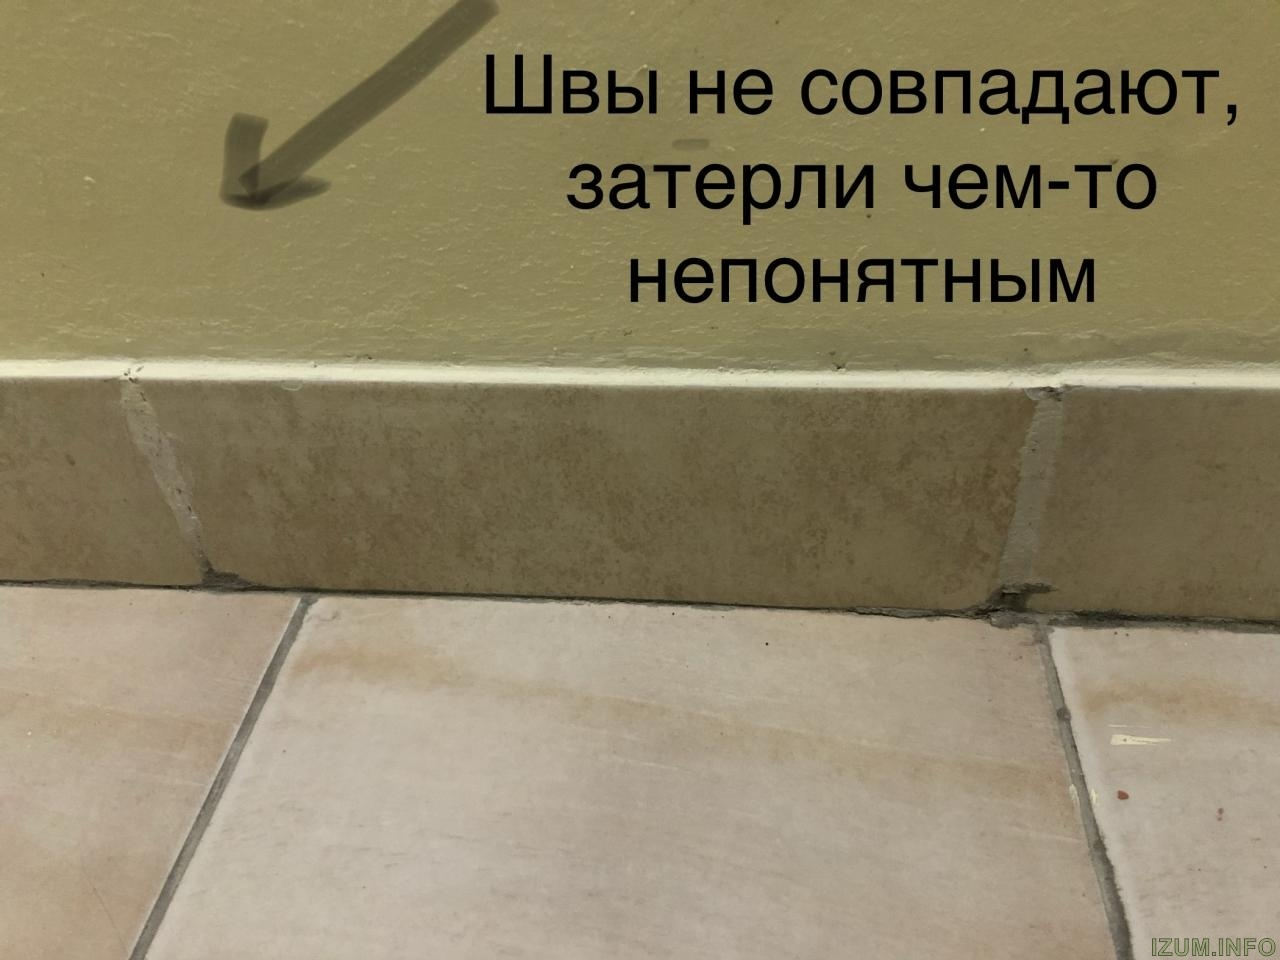 56892C27-8326-4230-8997-0C09D6FD83D0.jpeg